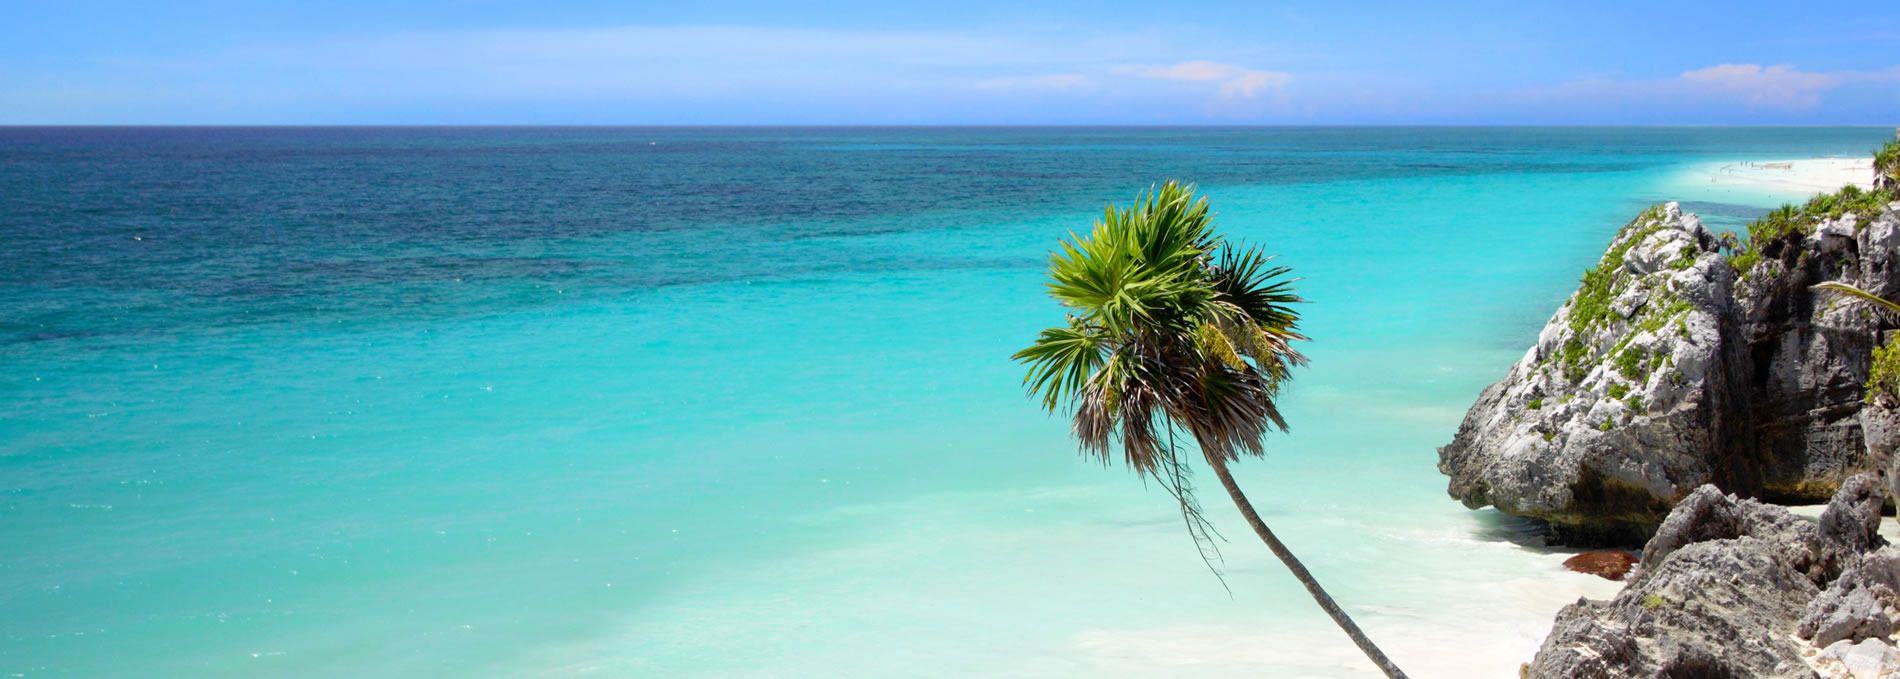 majorca-holiday-offer